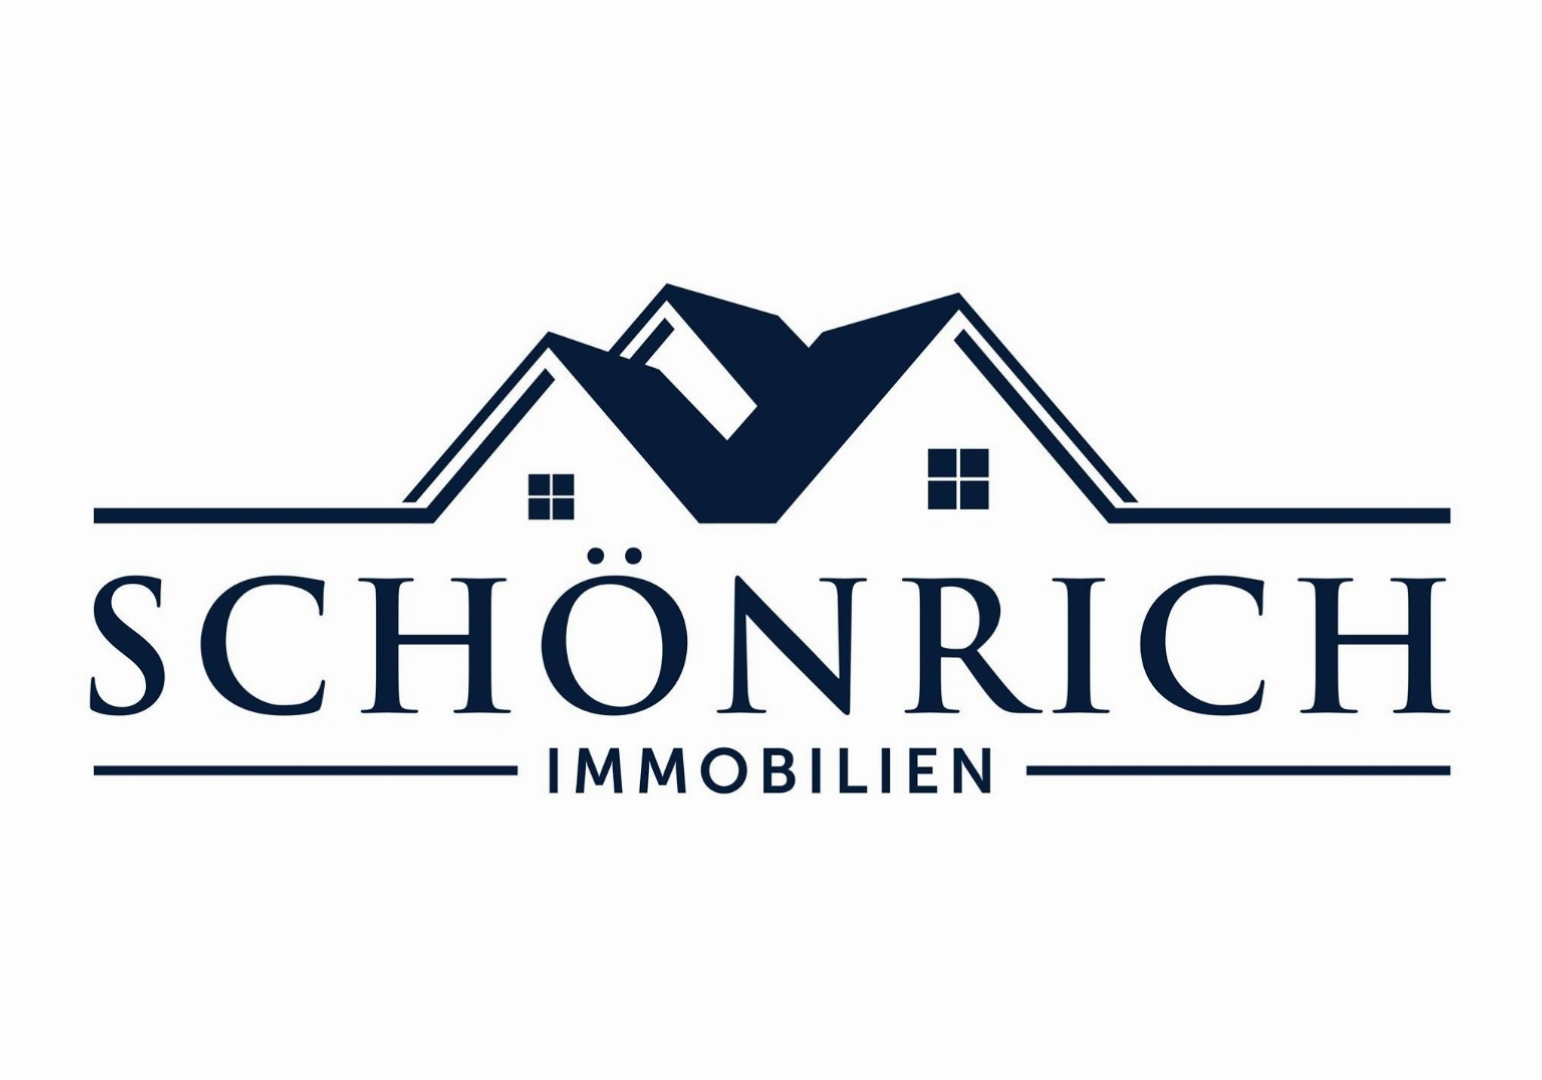 http://schoenrich-immobilien.de/